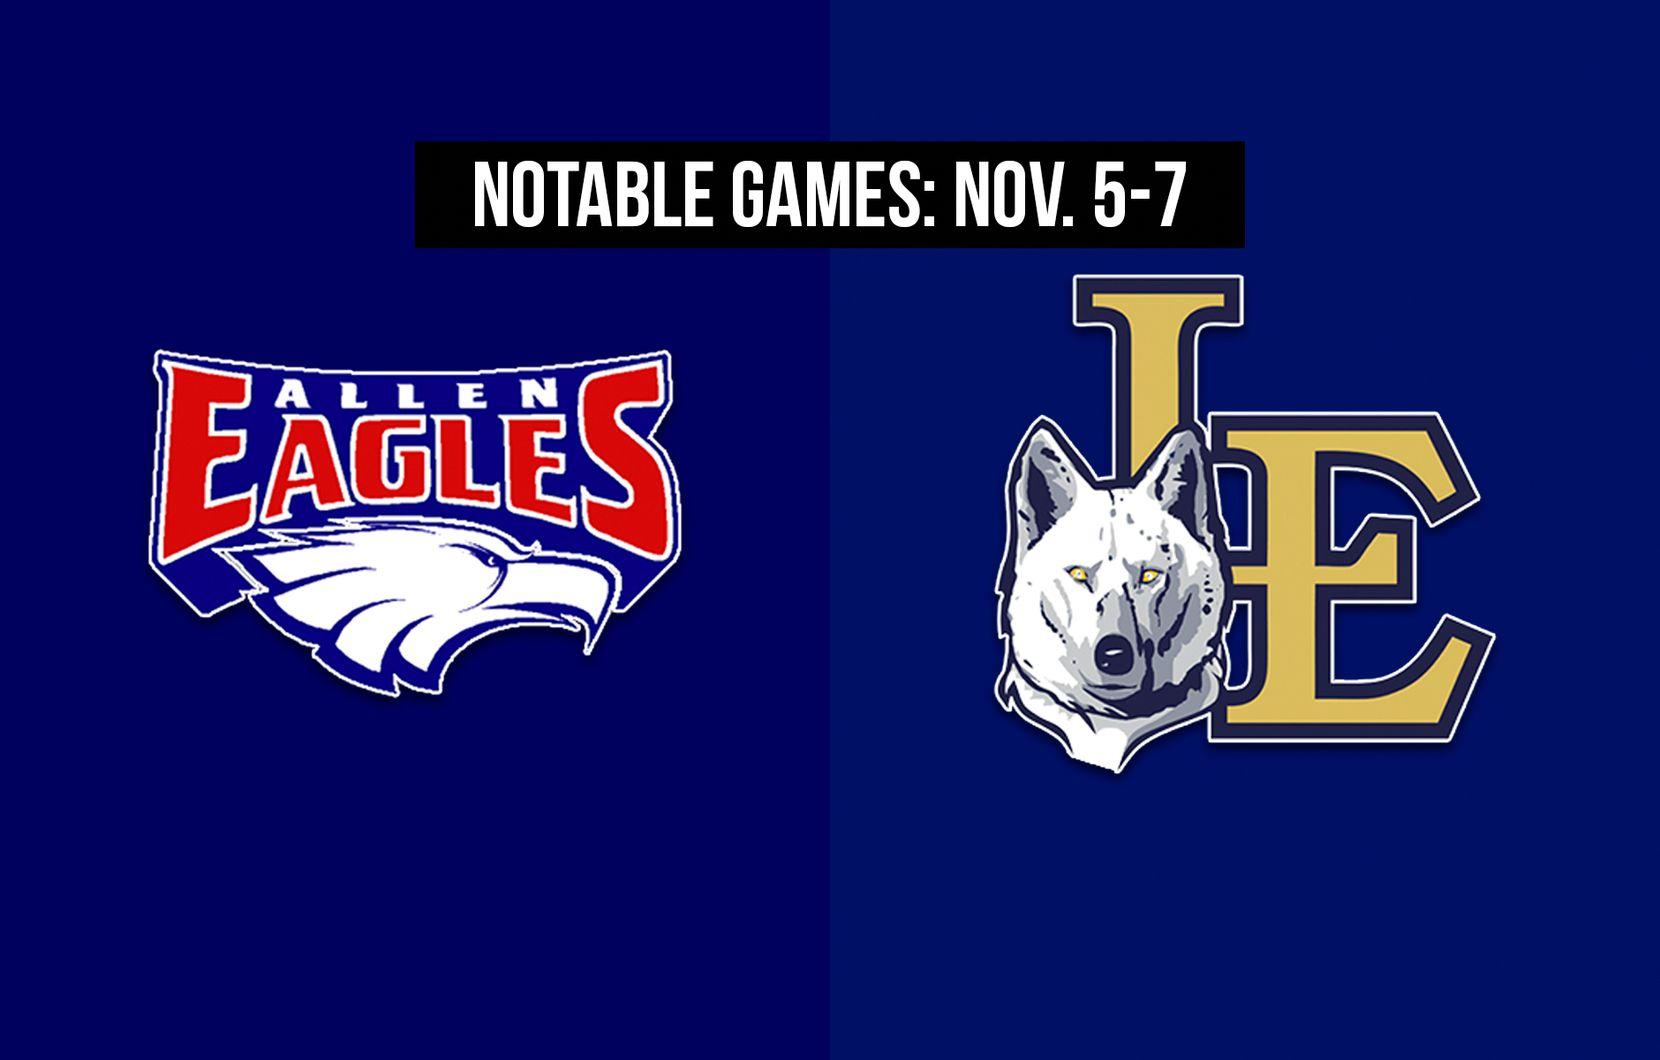 Notable games for the week of Nov. 5-7 of the 2020 season: Allen vs. Little Elm.